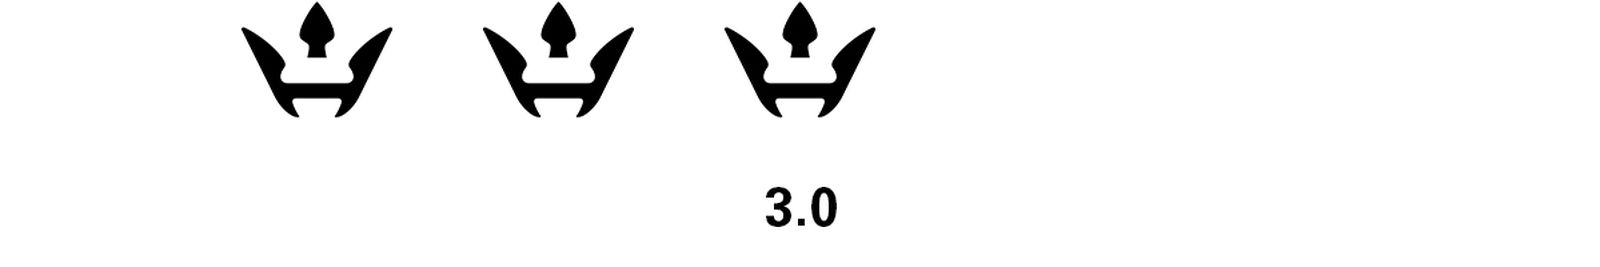 3.0 88rising BALLADS 1 Joji